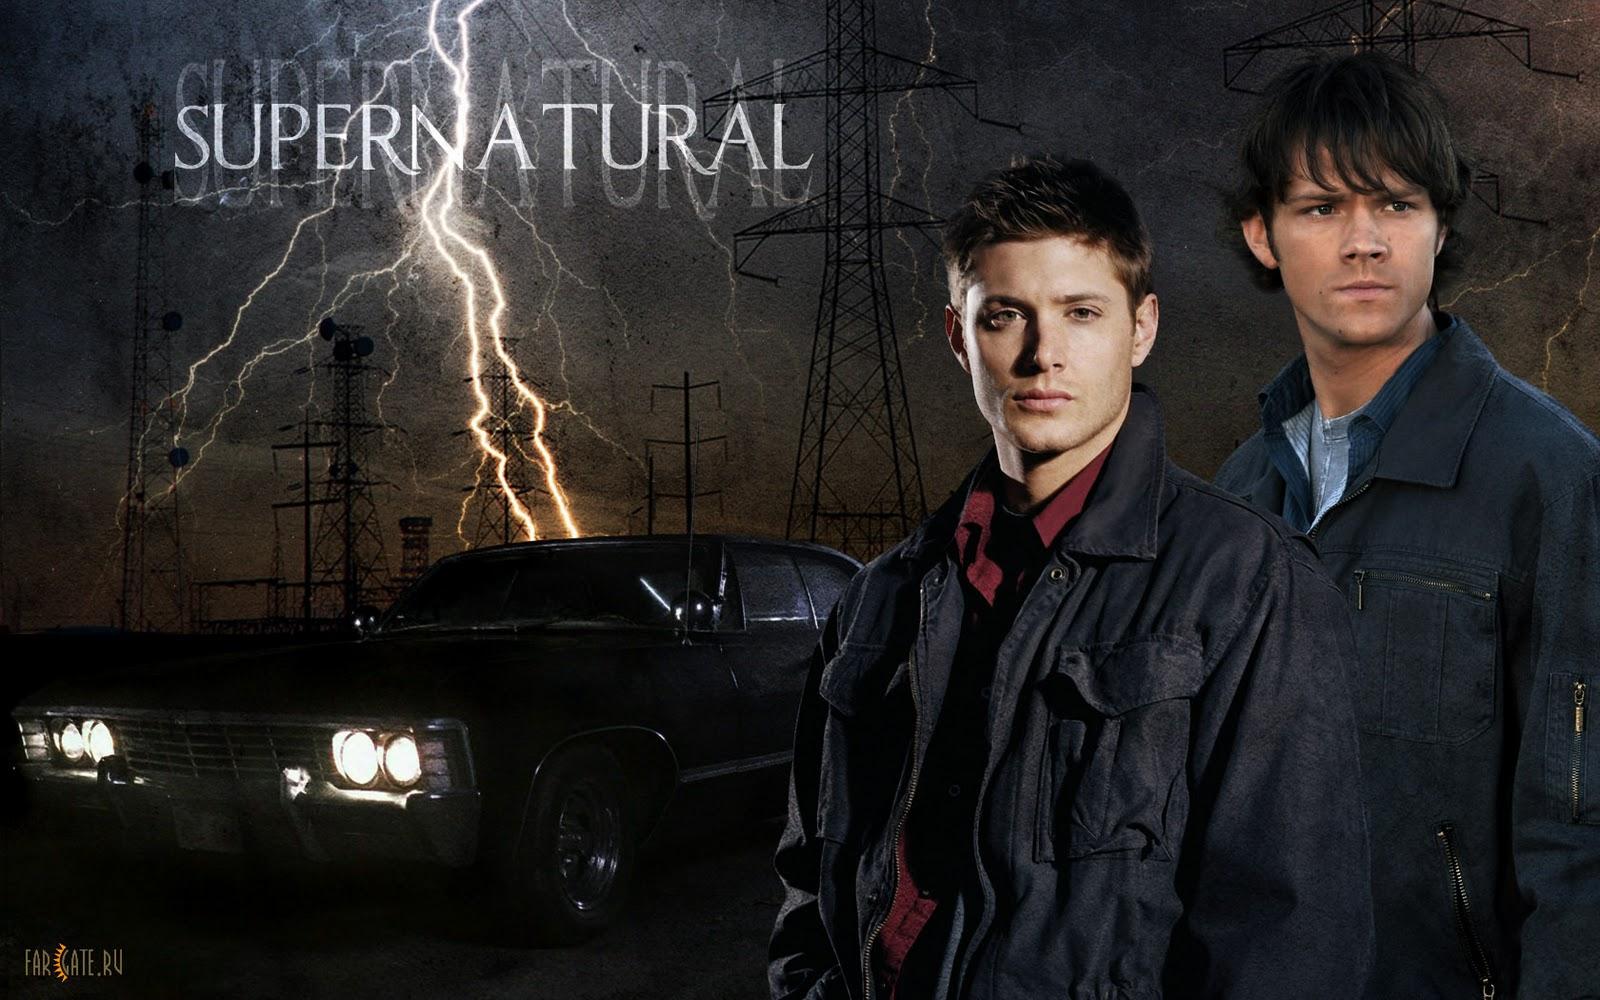 http://4.bp.blogspot.com/-8WlIgQM5Jn4/TrrFdaeOADI/AAAAAAAACAo/cluvJ903F10/s1600/Supernatural-supernatural-6276113-1680-1050.jpg